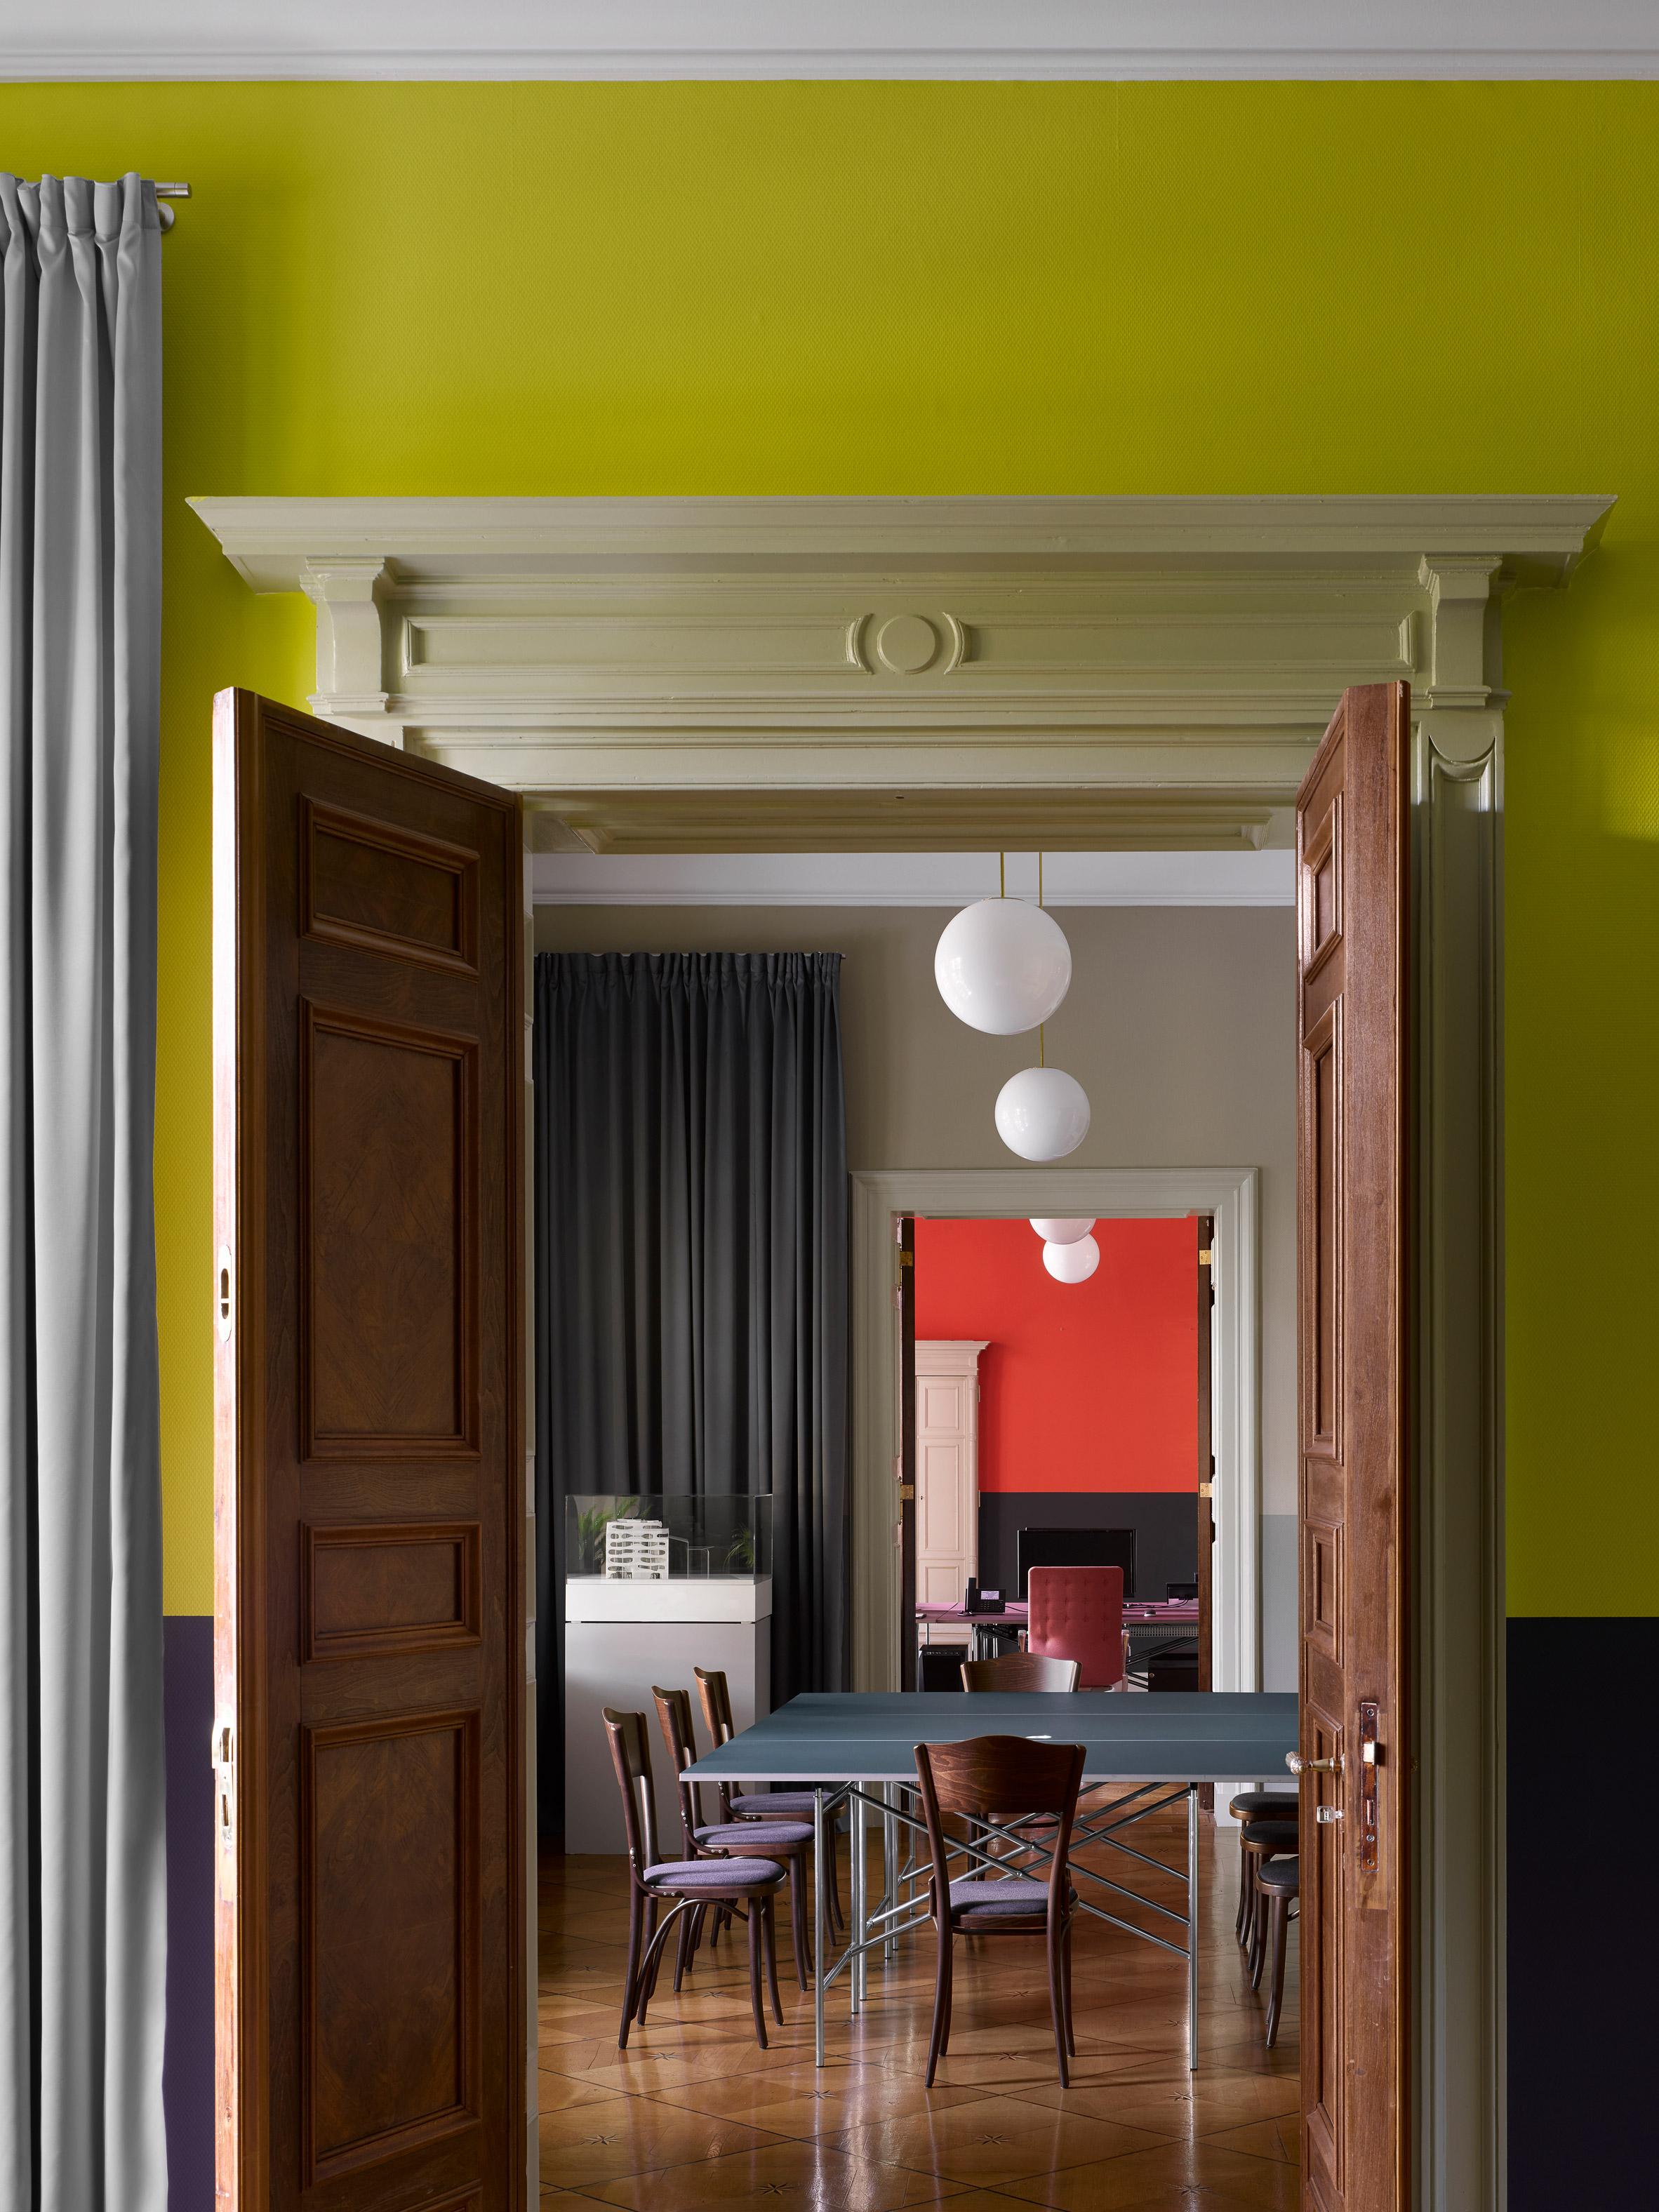 Euroboden's Berlin office, designed by David Kohn Architects